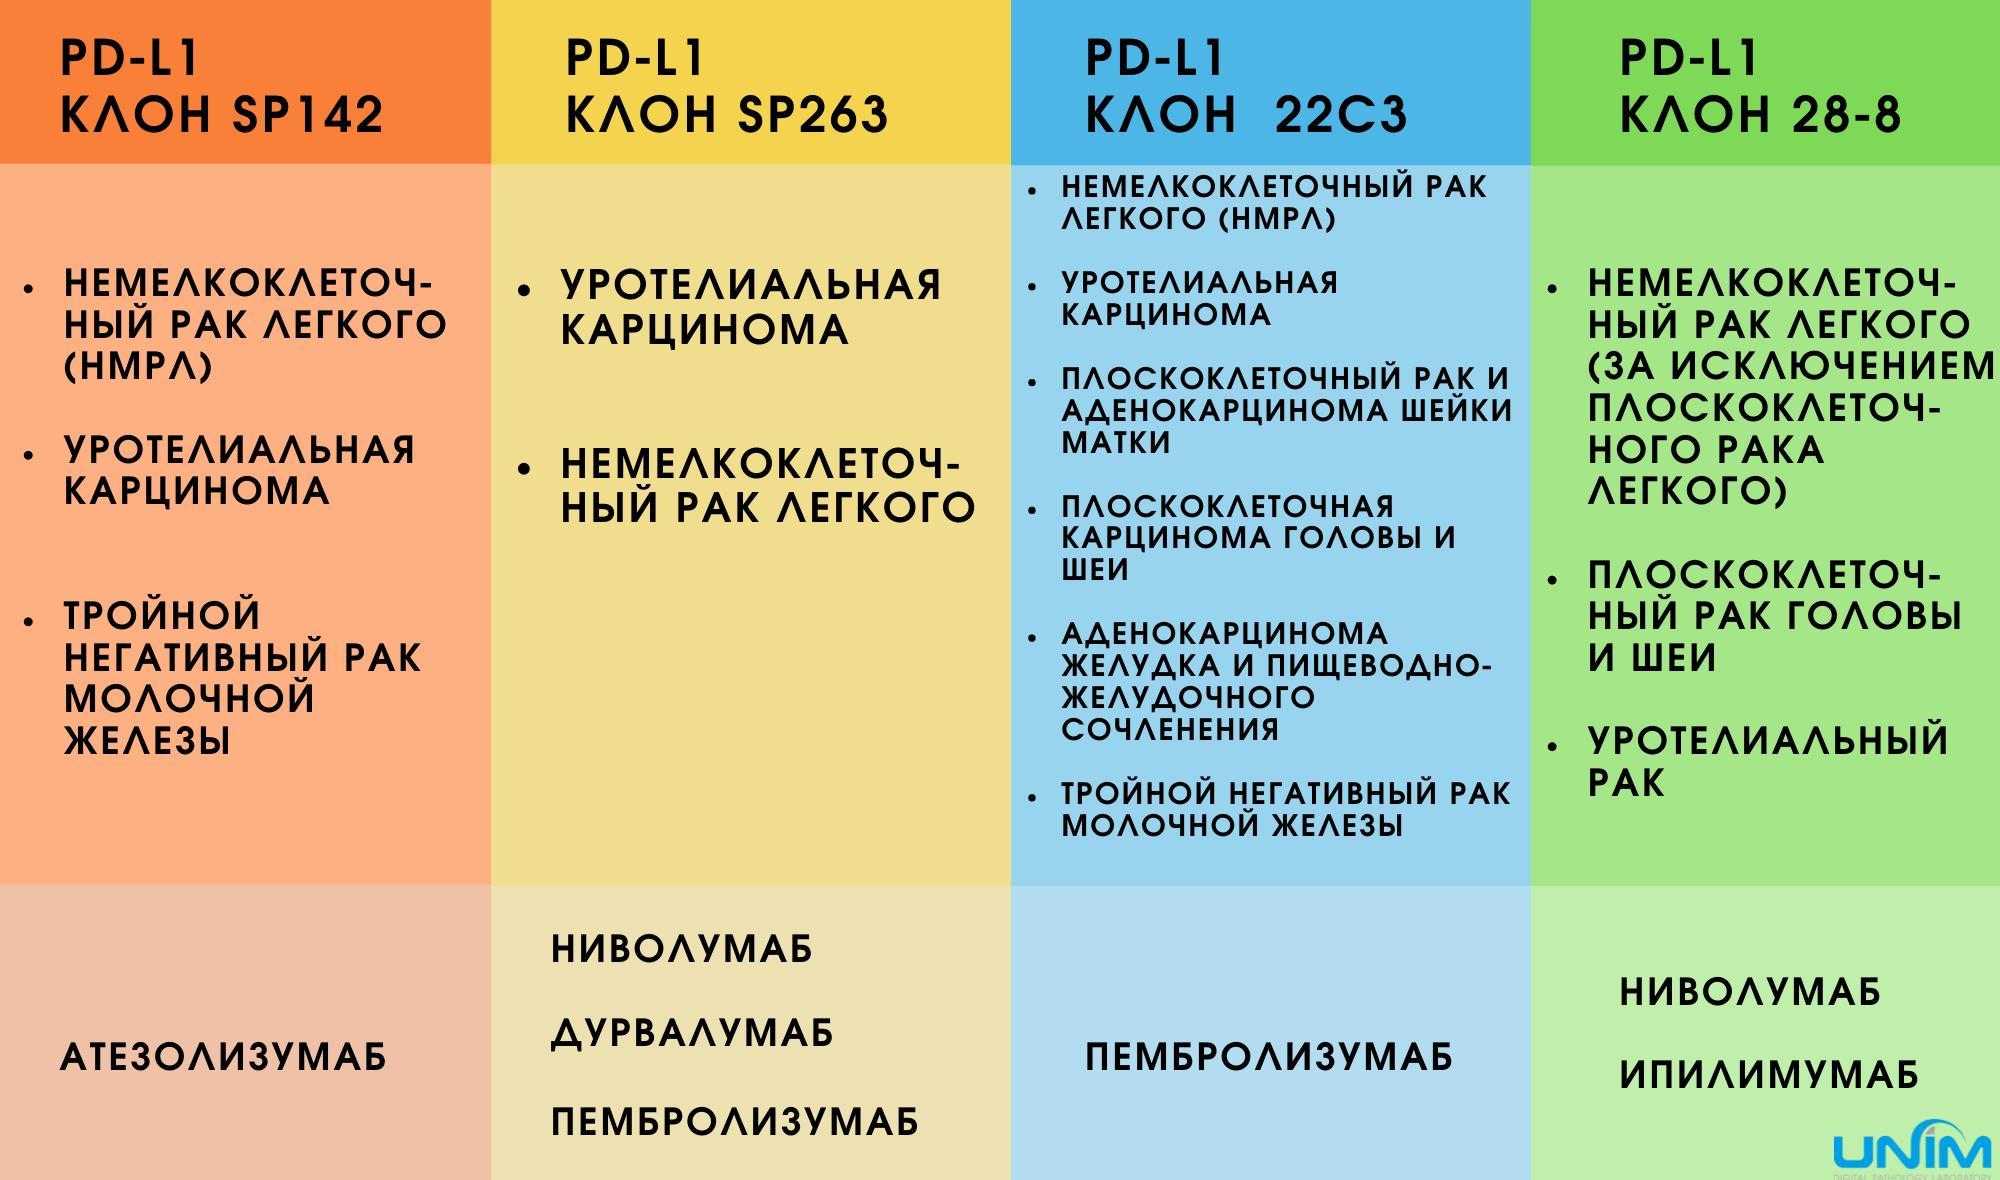 PD-L1 клоны